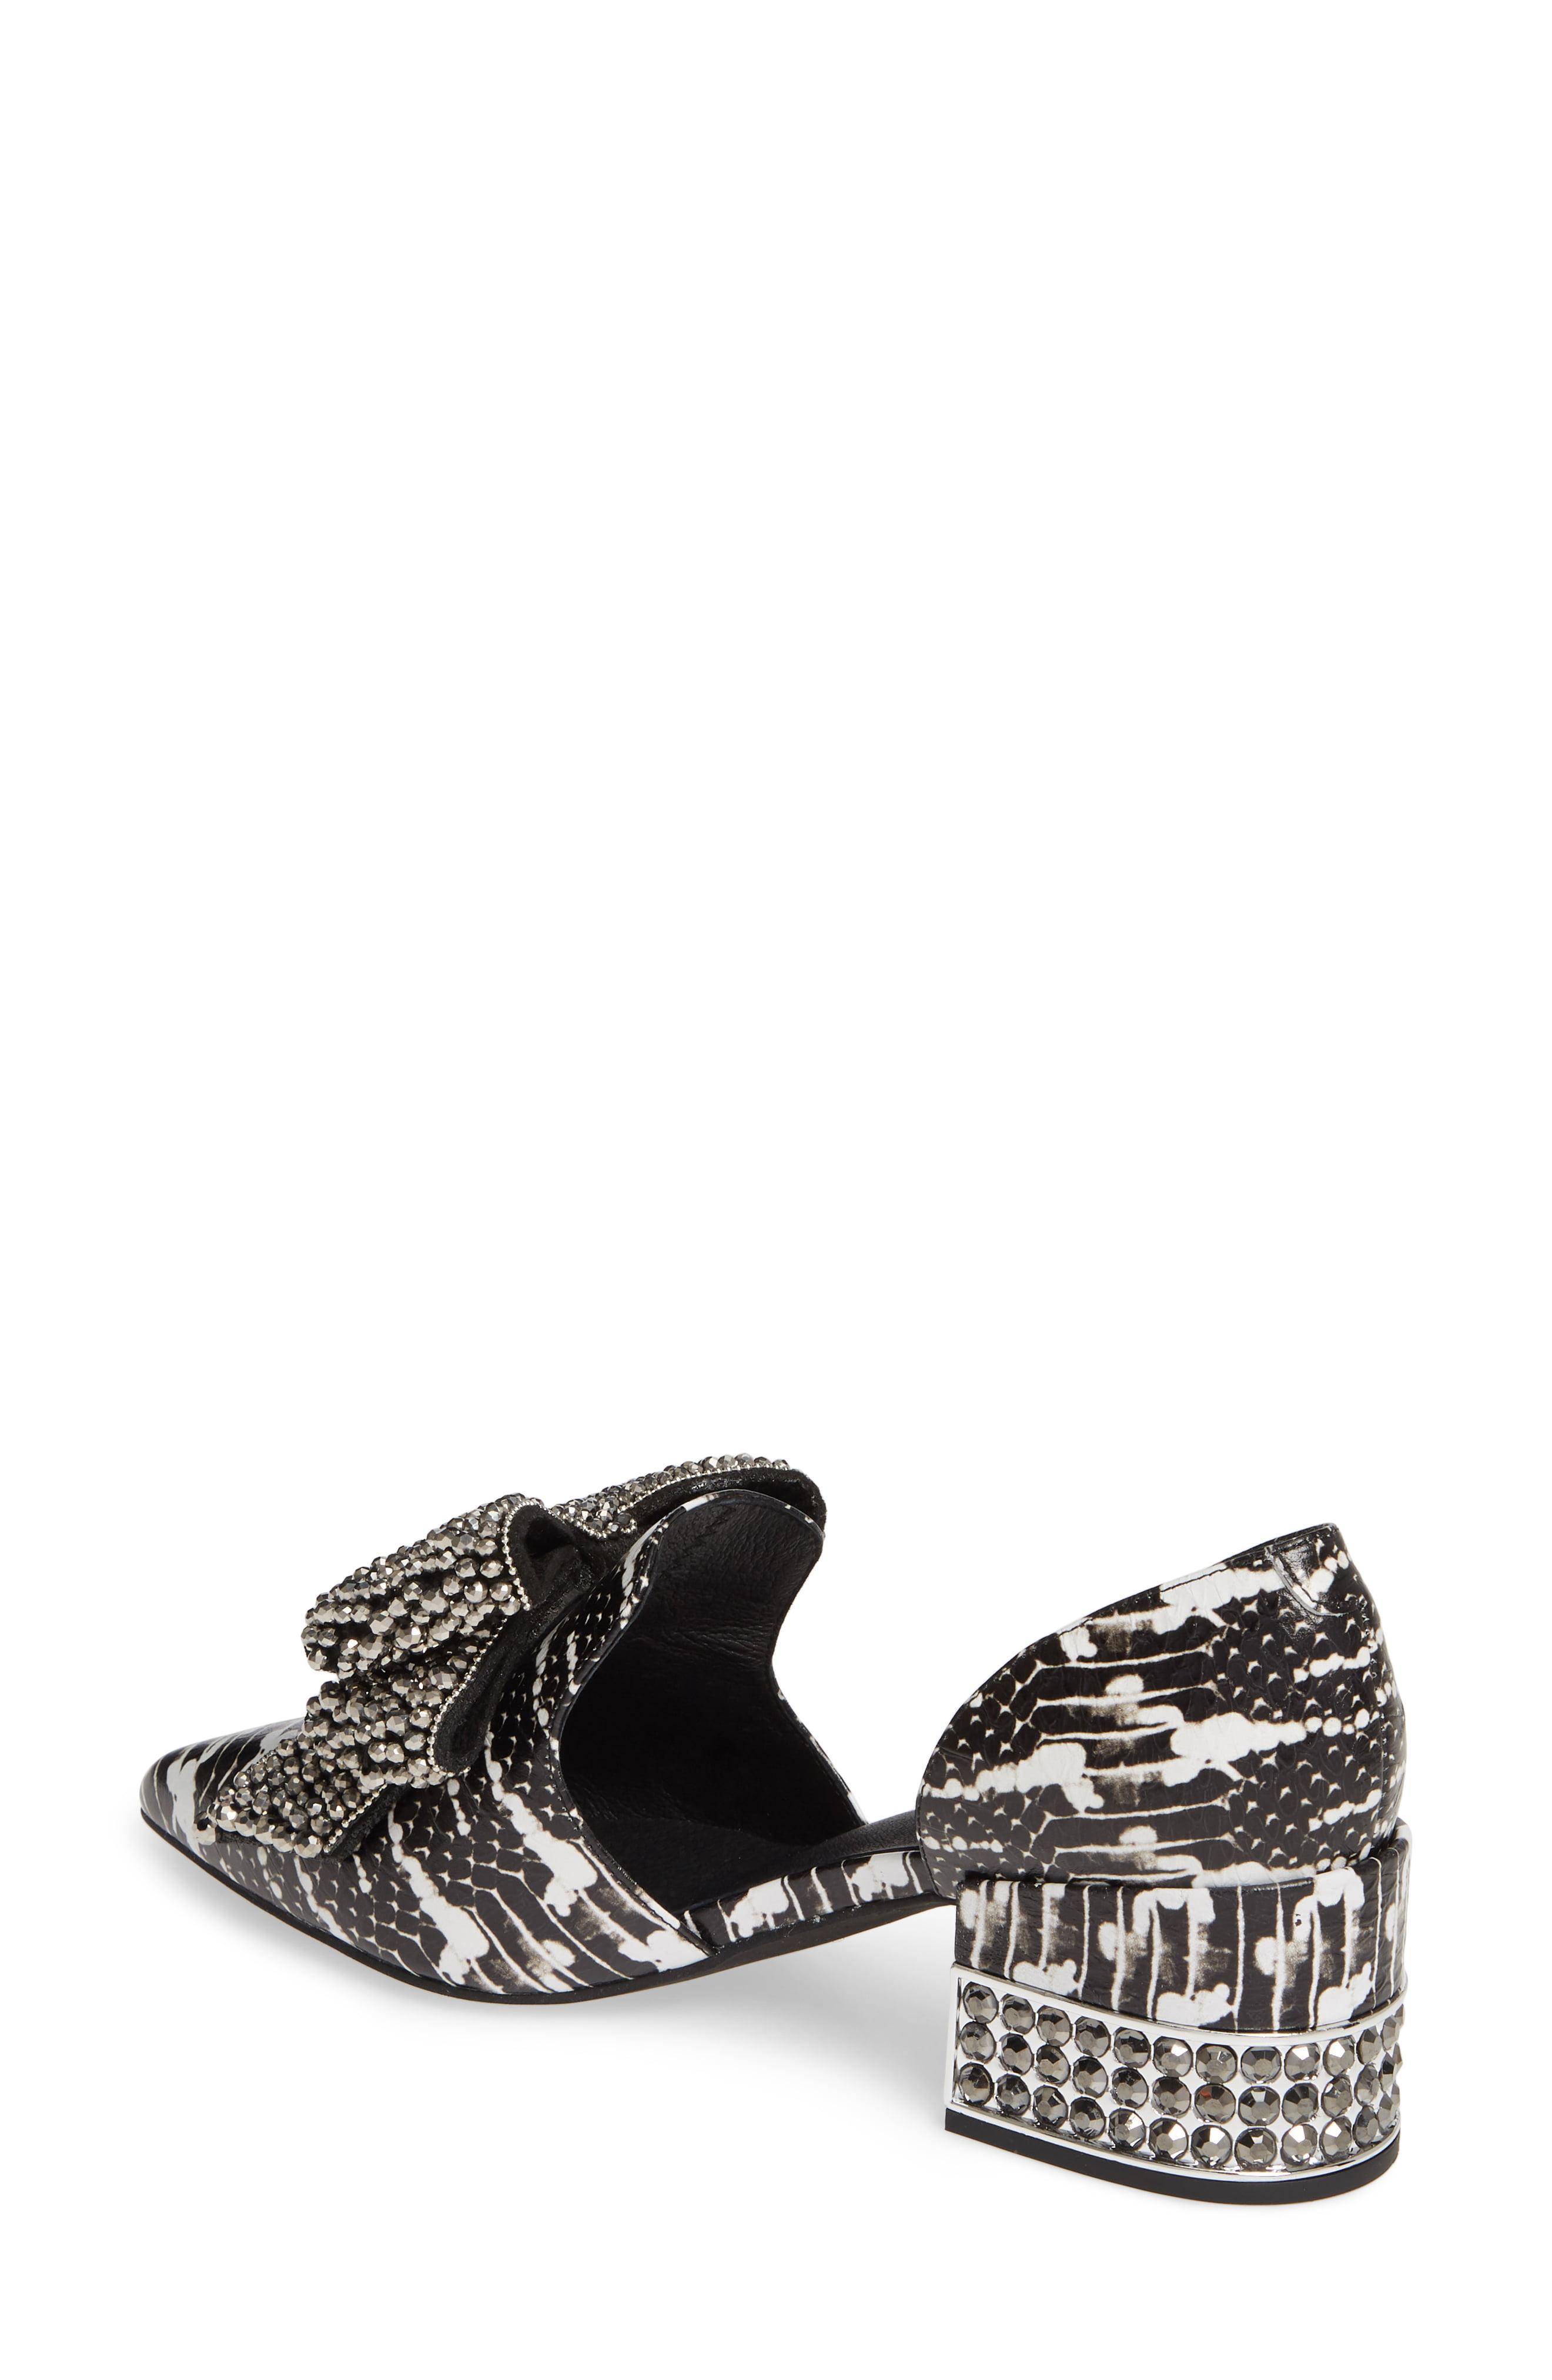 d90b8cbdf7e Jeffrey Campbell - Black Valenti Embellished Bow Loafer - Lyst. View  fullscreen